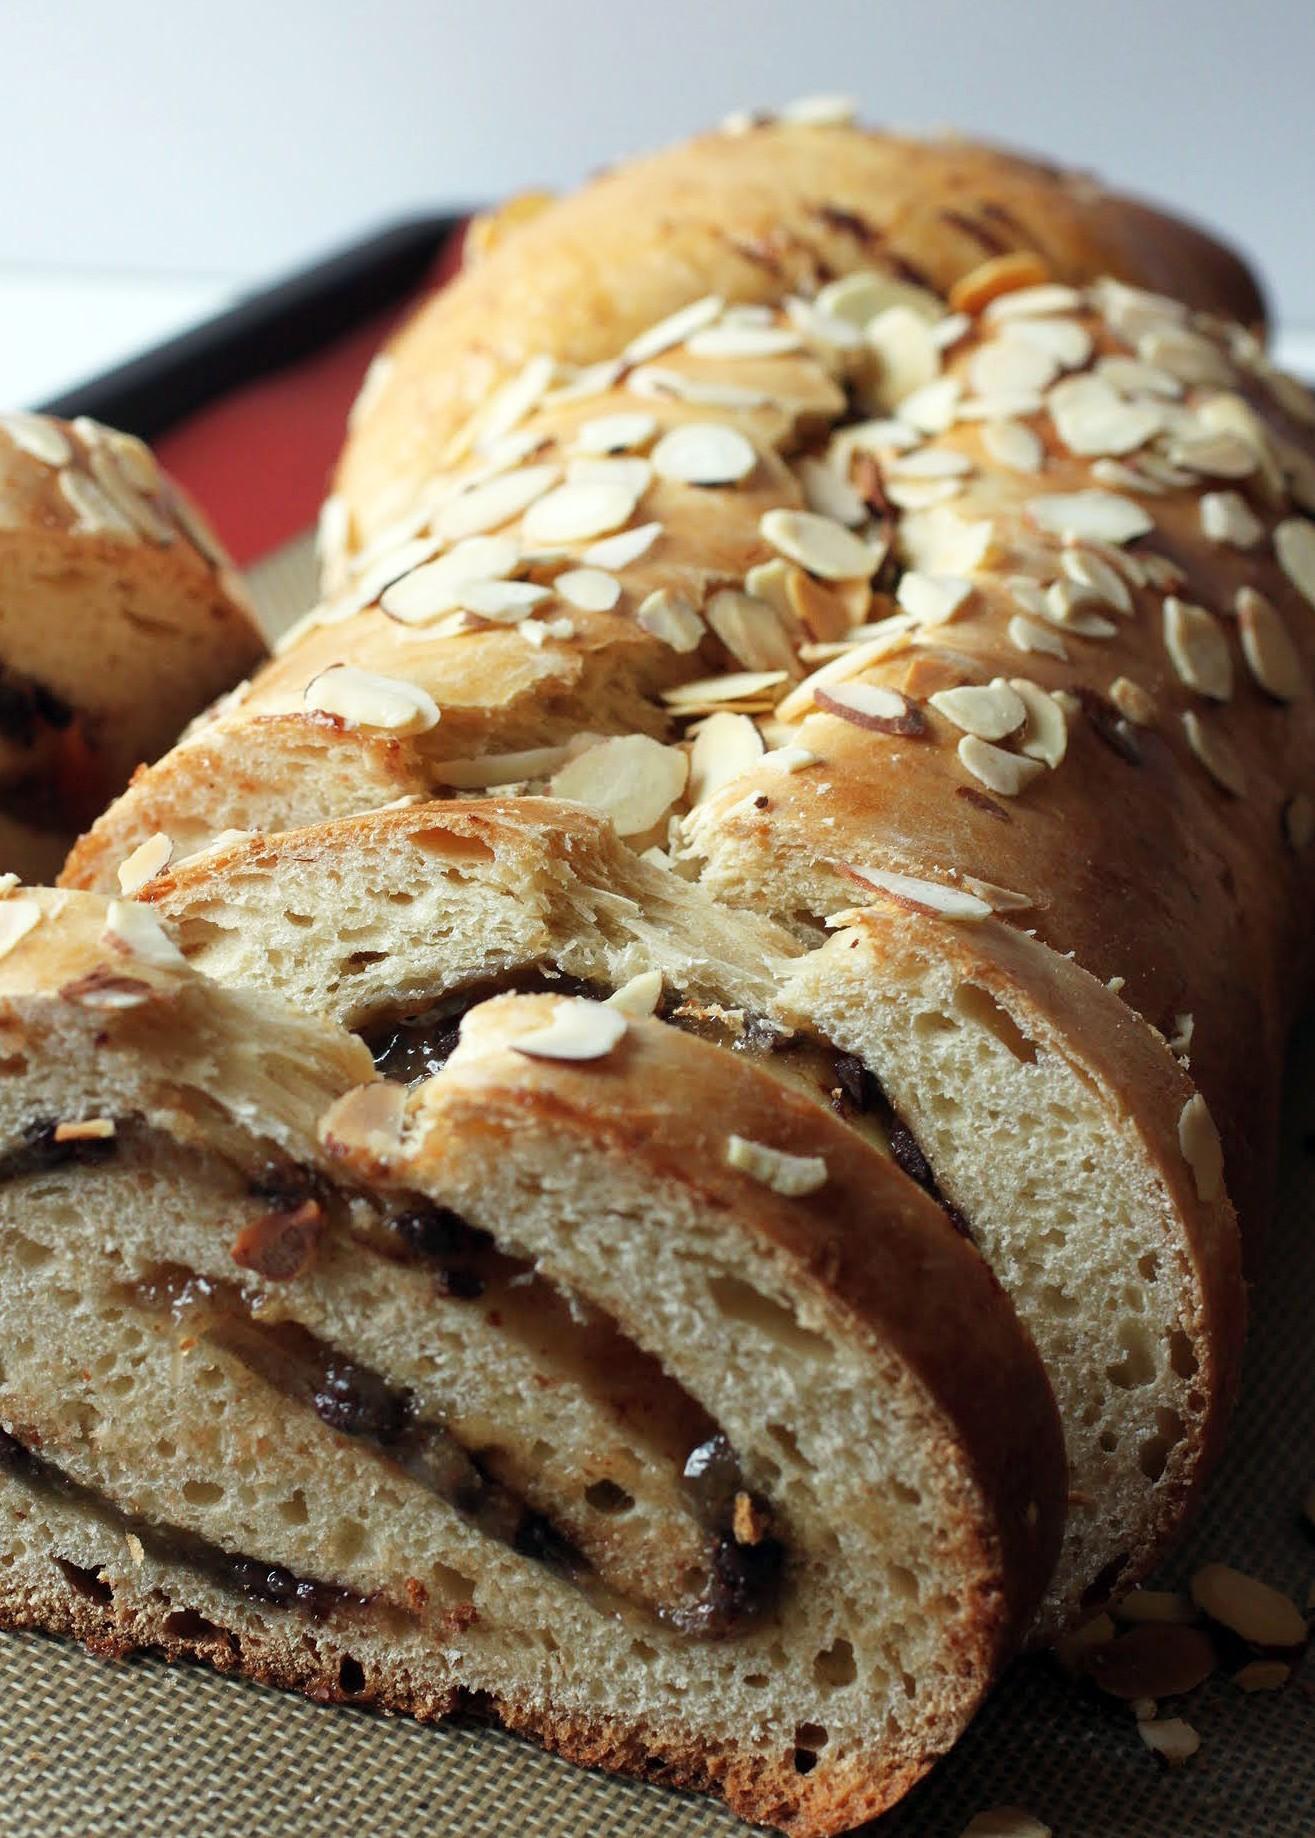 Almond Chocolate Swirl Bread